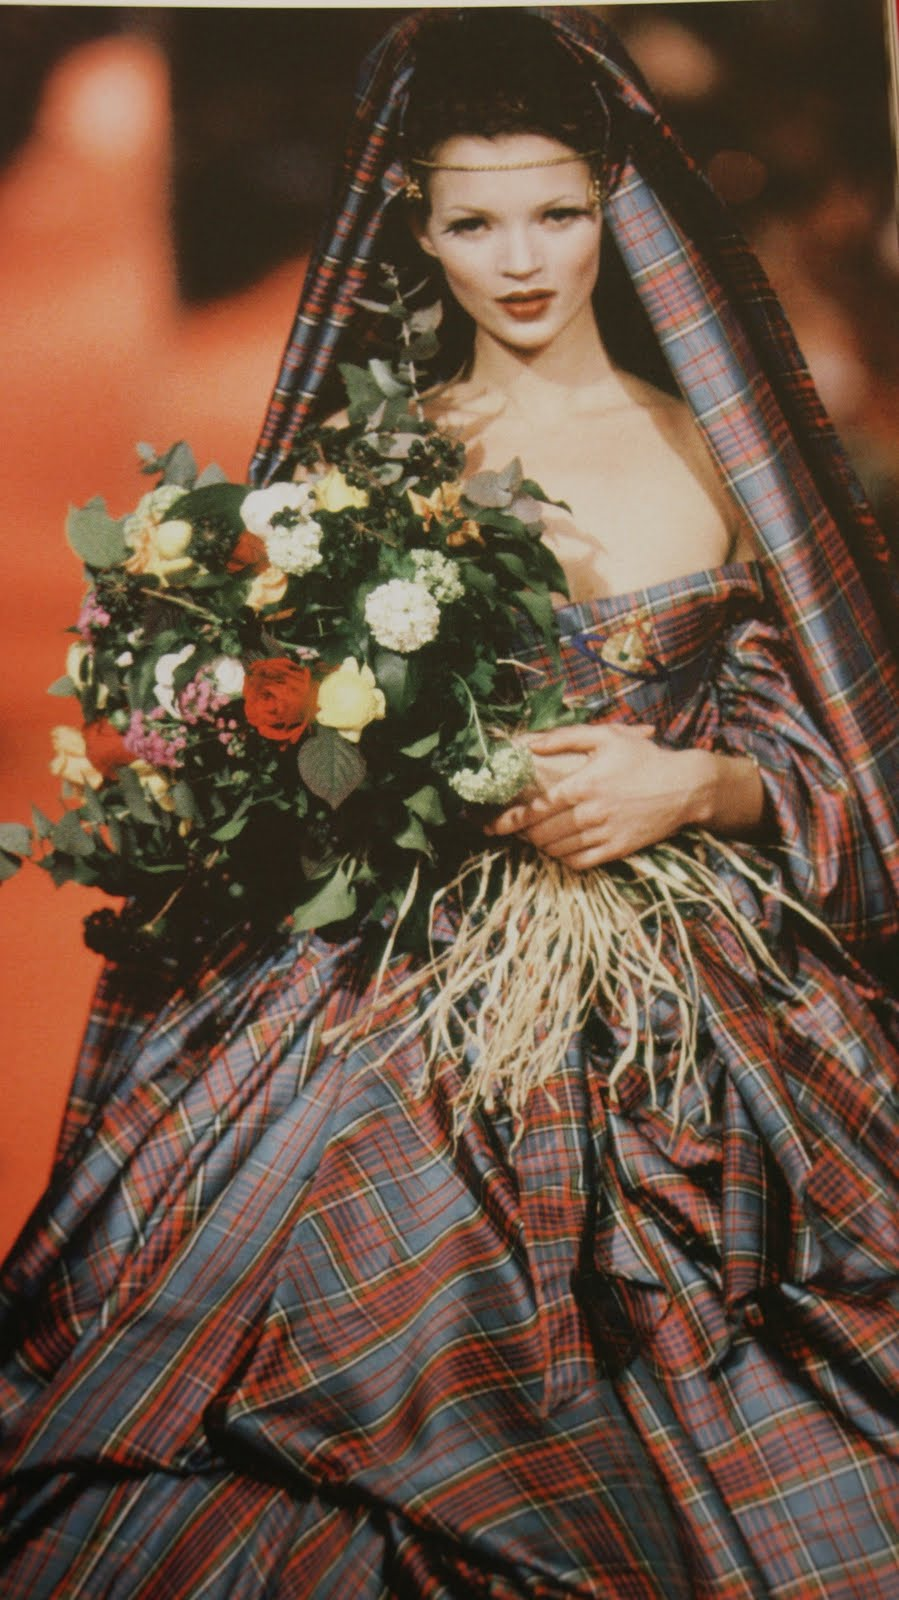 Celtic wedding dresses wedding plan ideas for Scottish wedding dresses with tartan